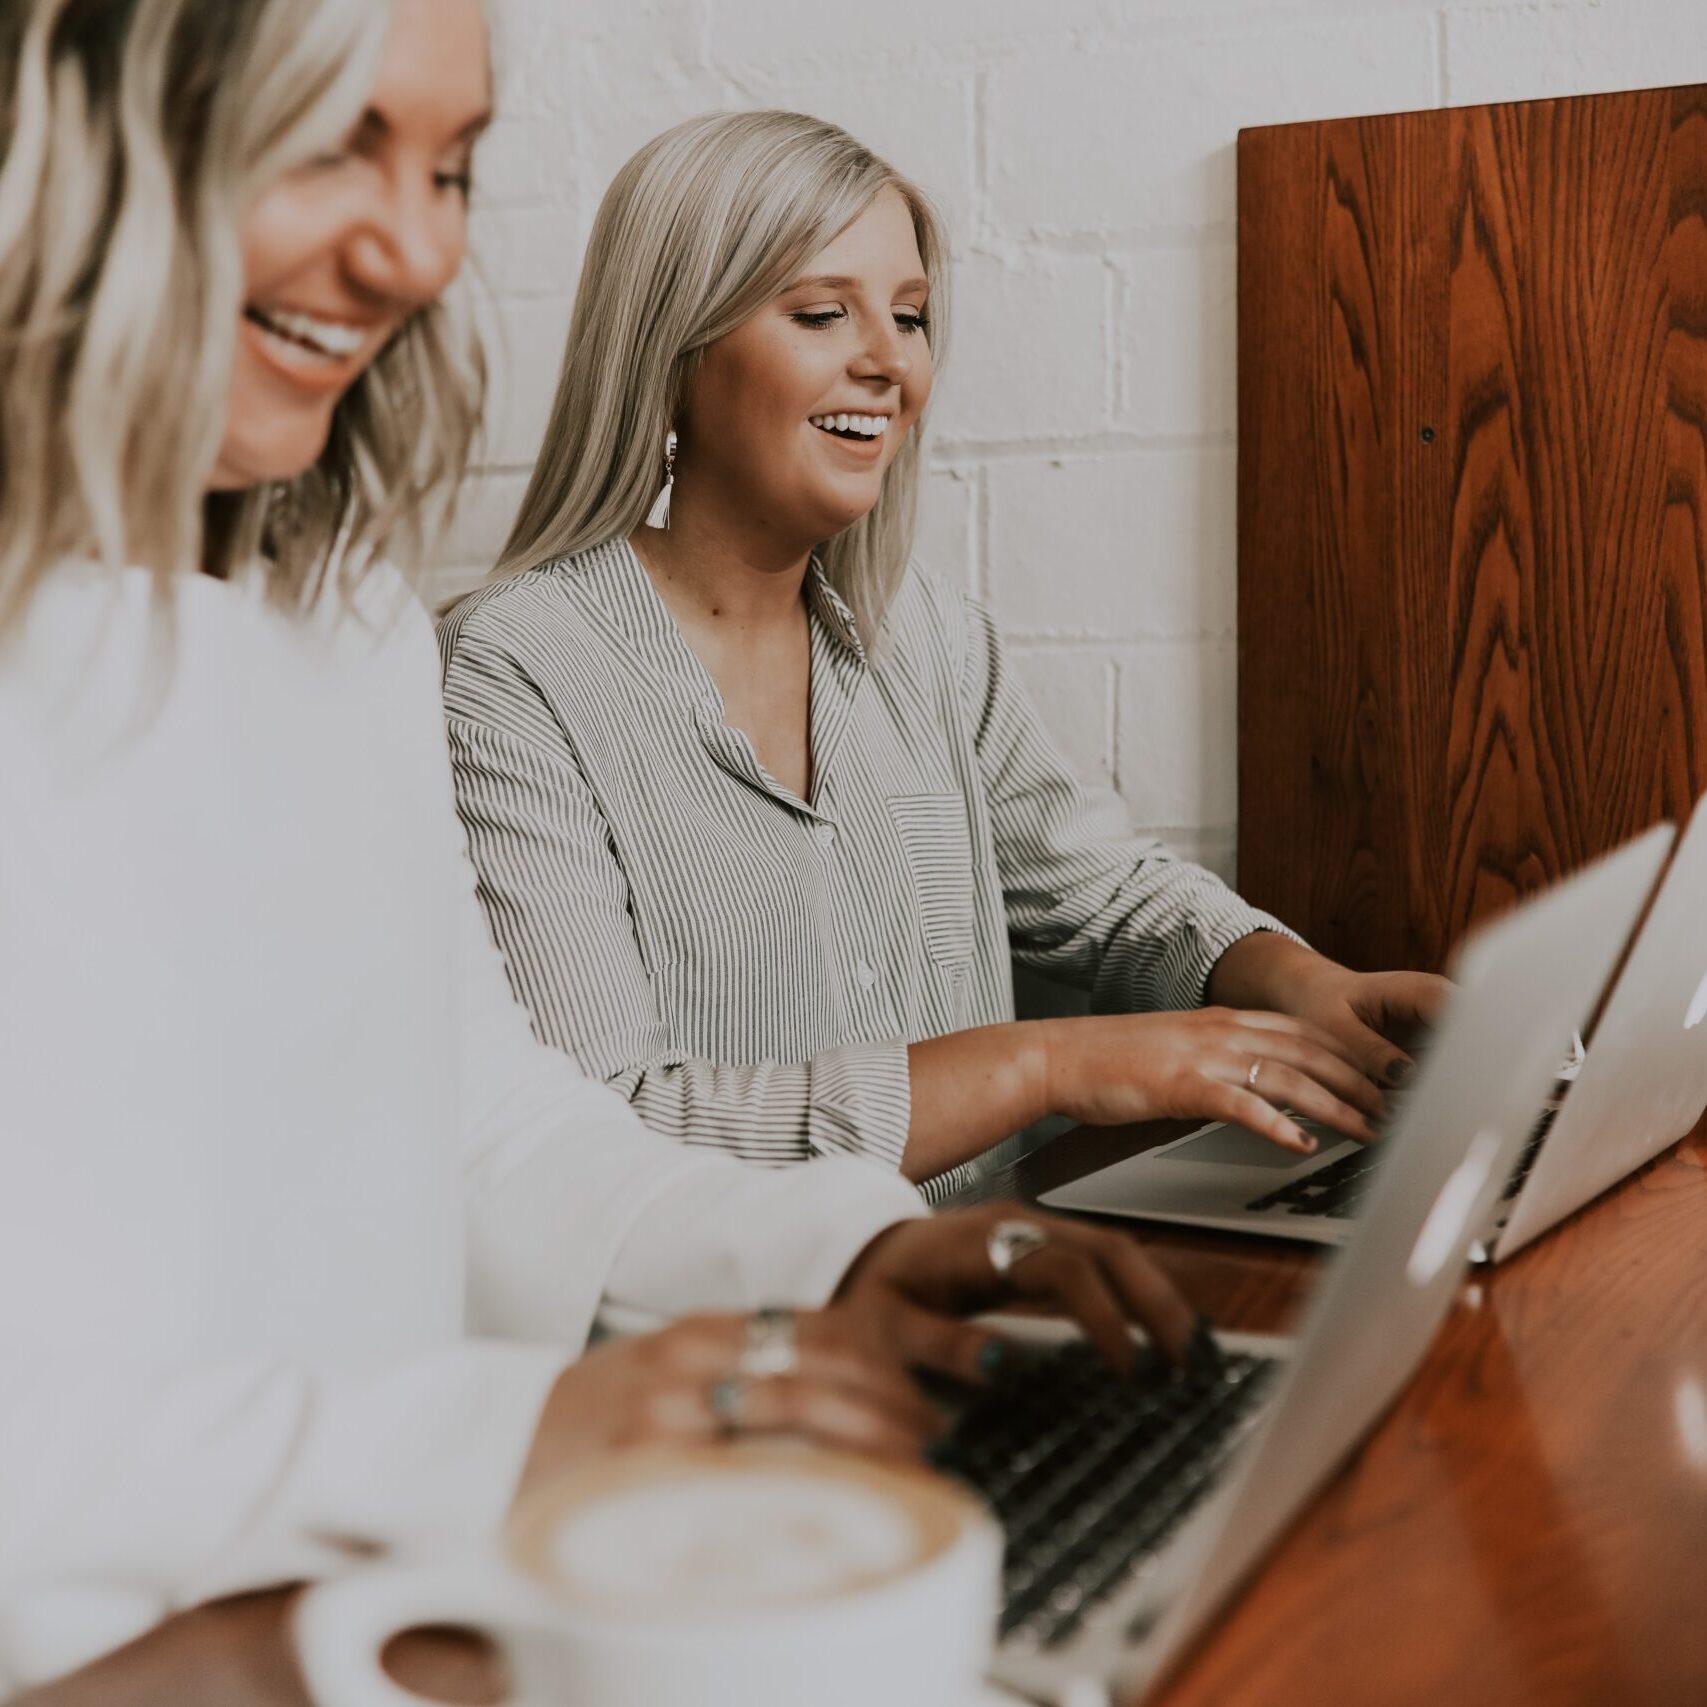 Two women on their laptops